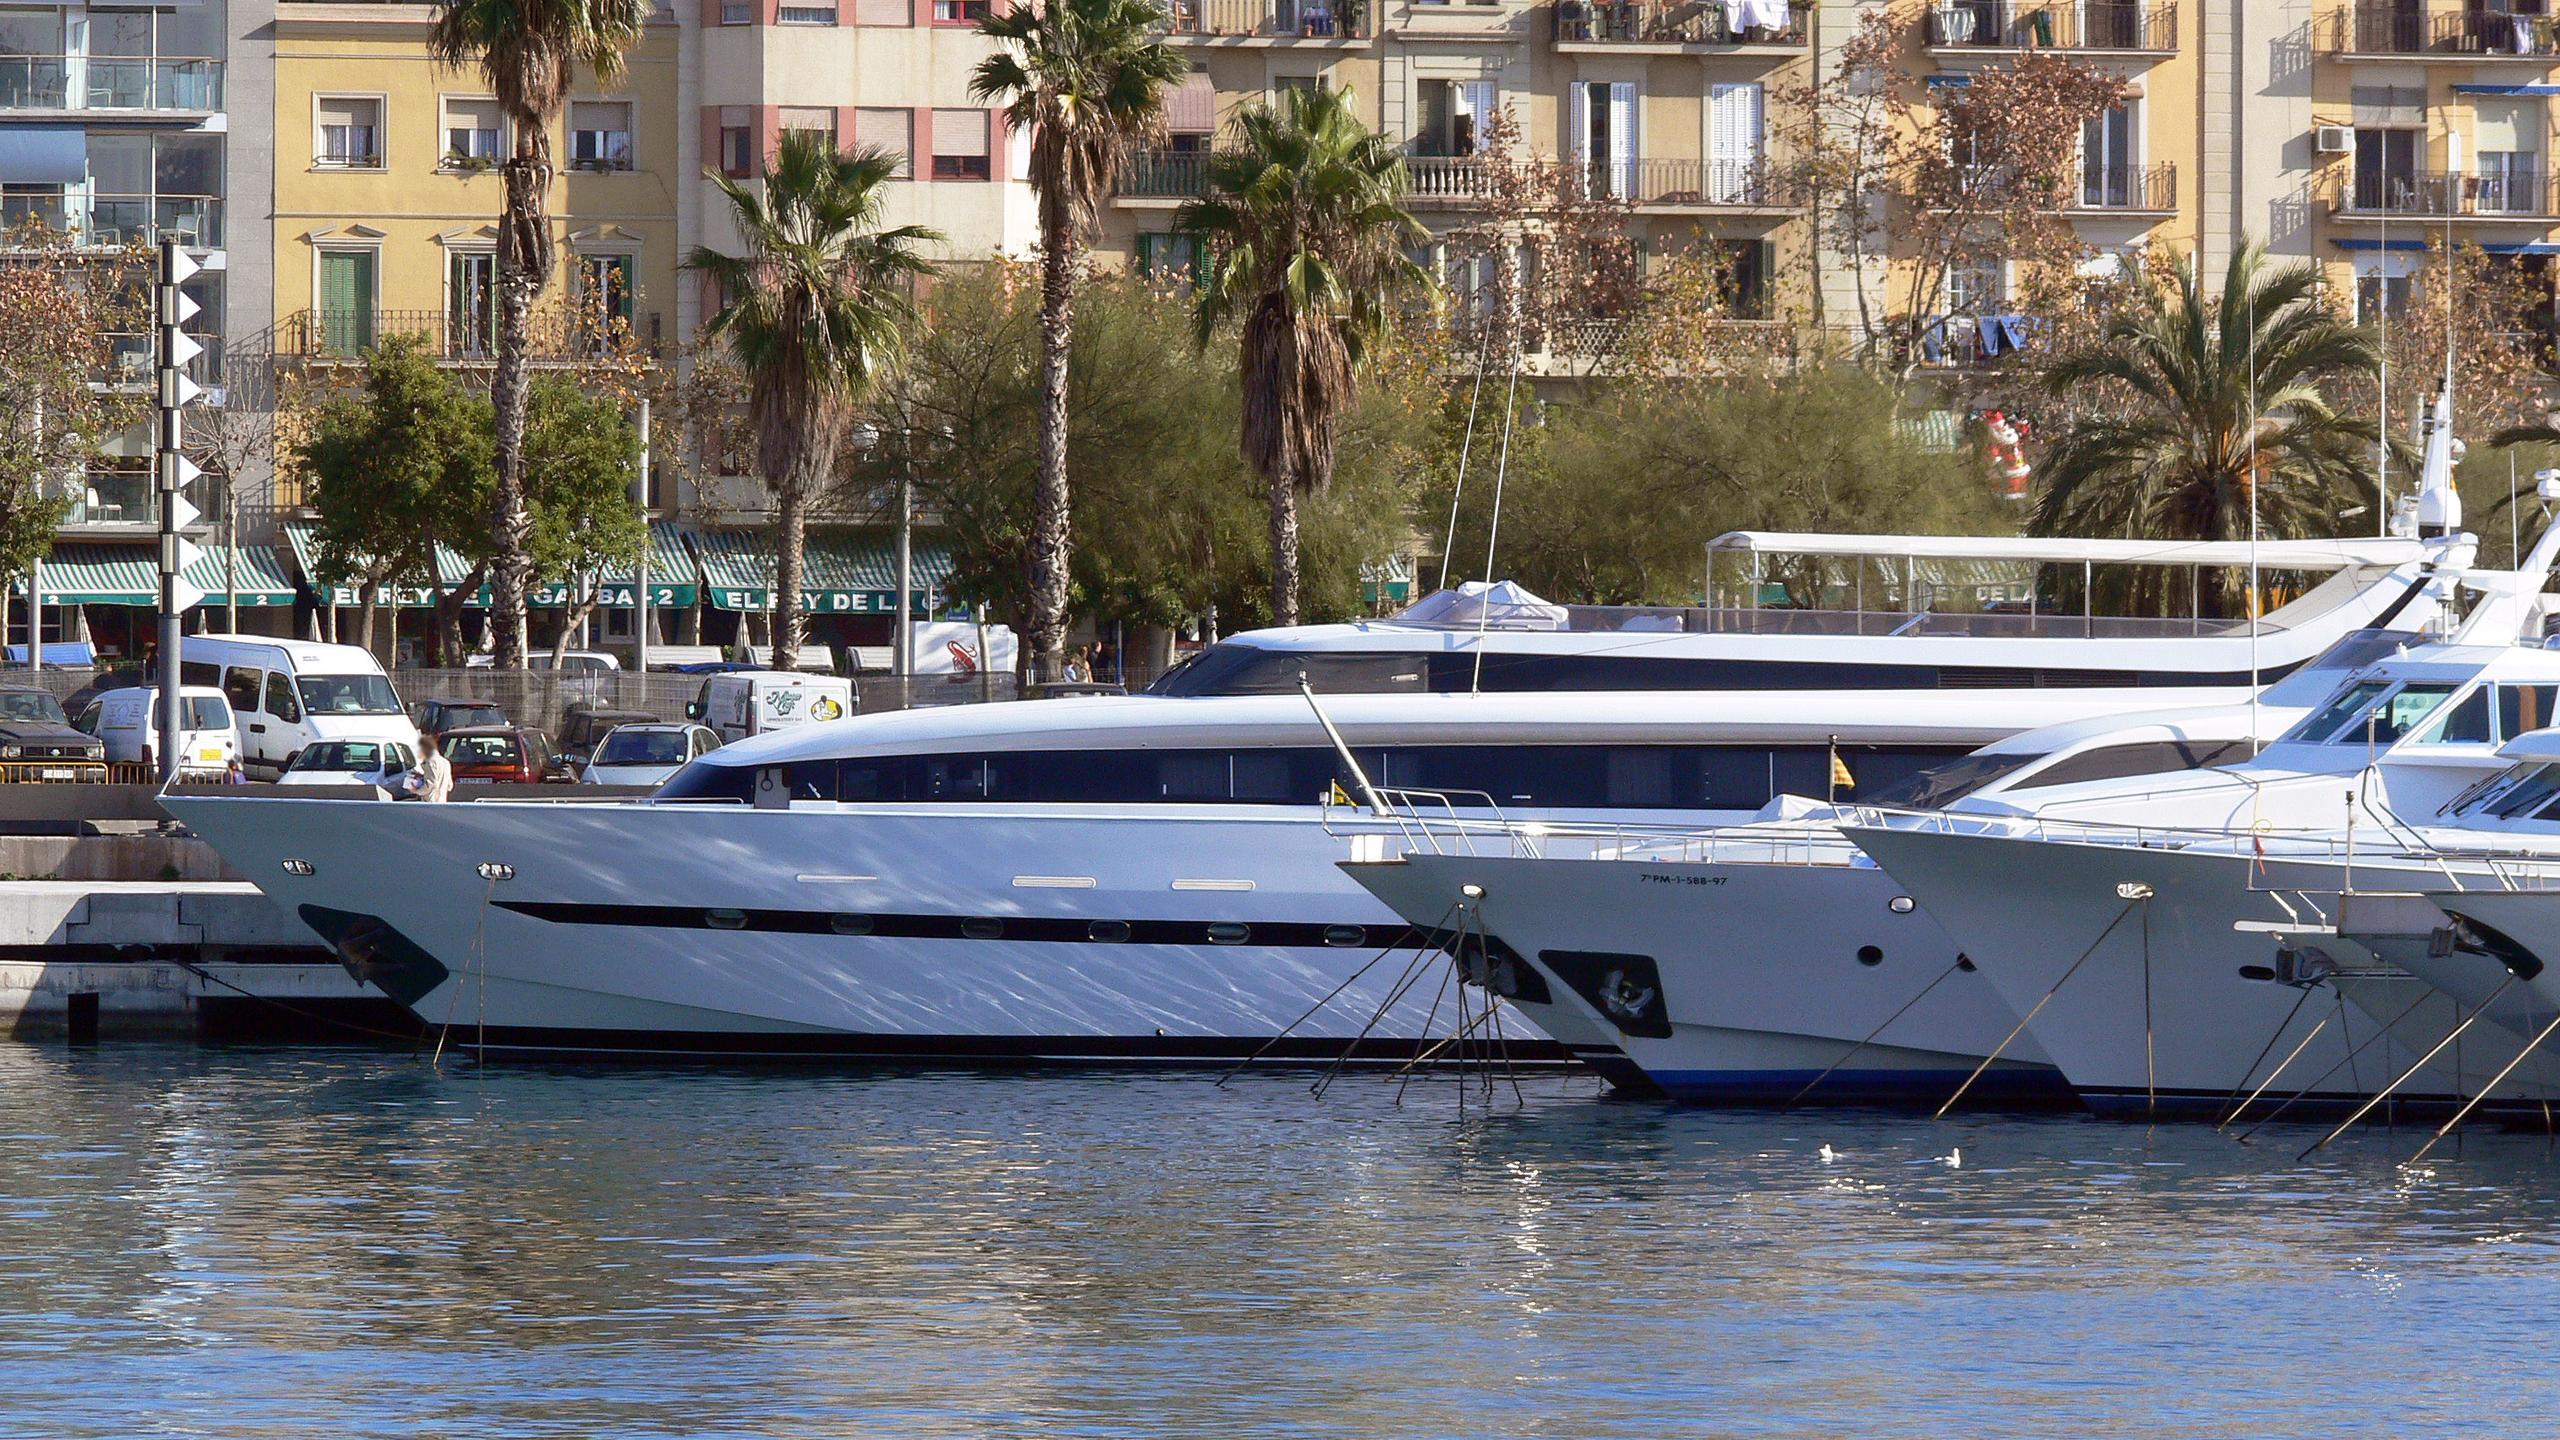 ocean-glass-beyond-the-sea-motor-yacht-mondomarine-1994-35m-profile